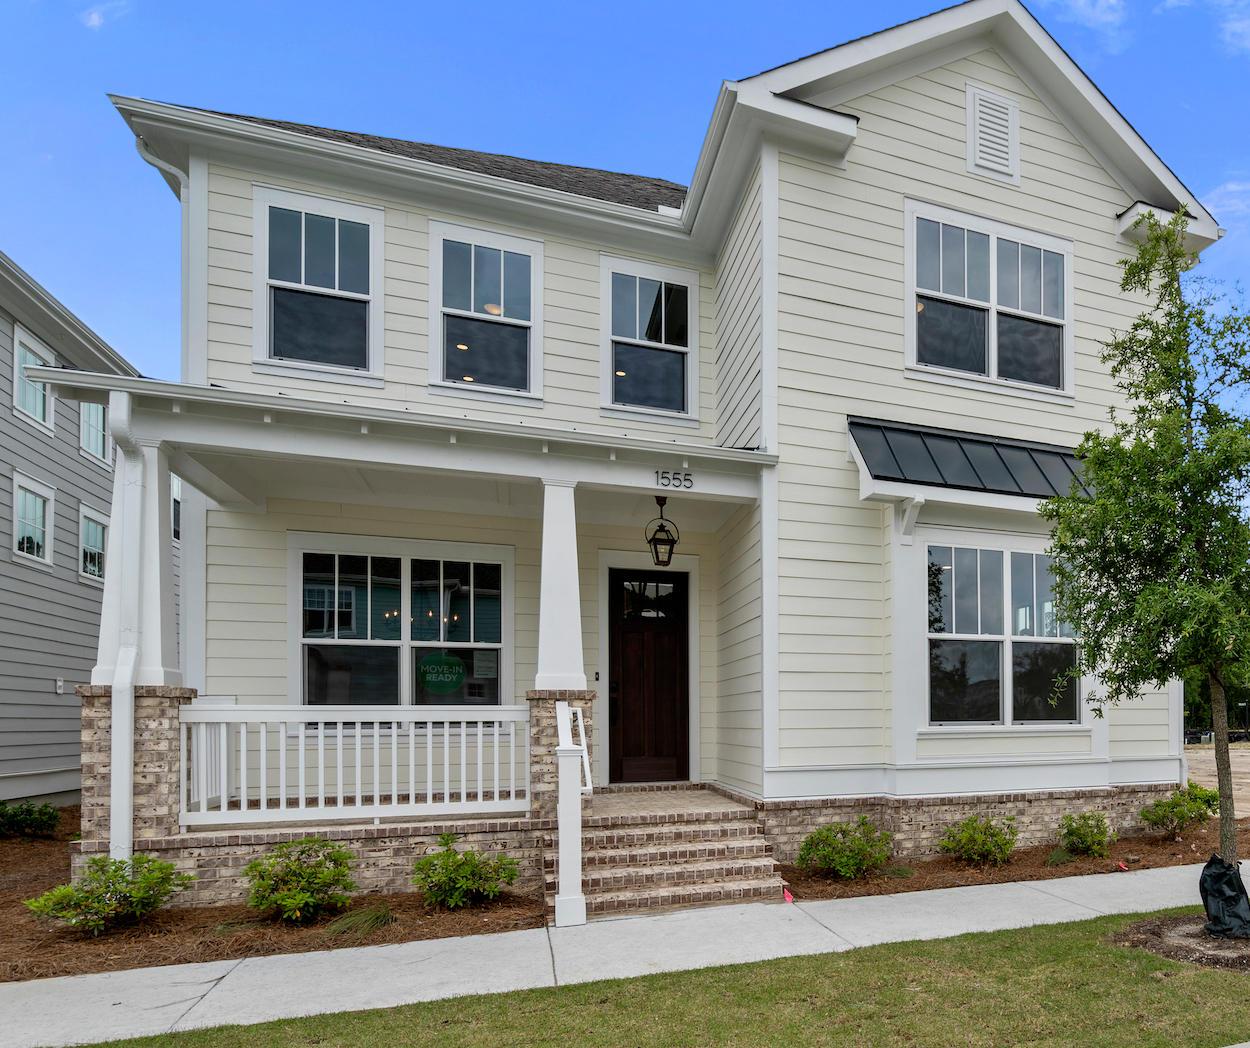 Midtown Homes For Sale - 1320 Upper Union, Mount Pleasant, SC - 27